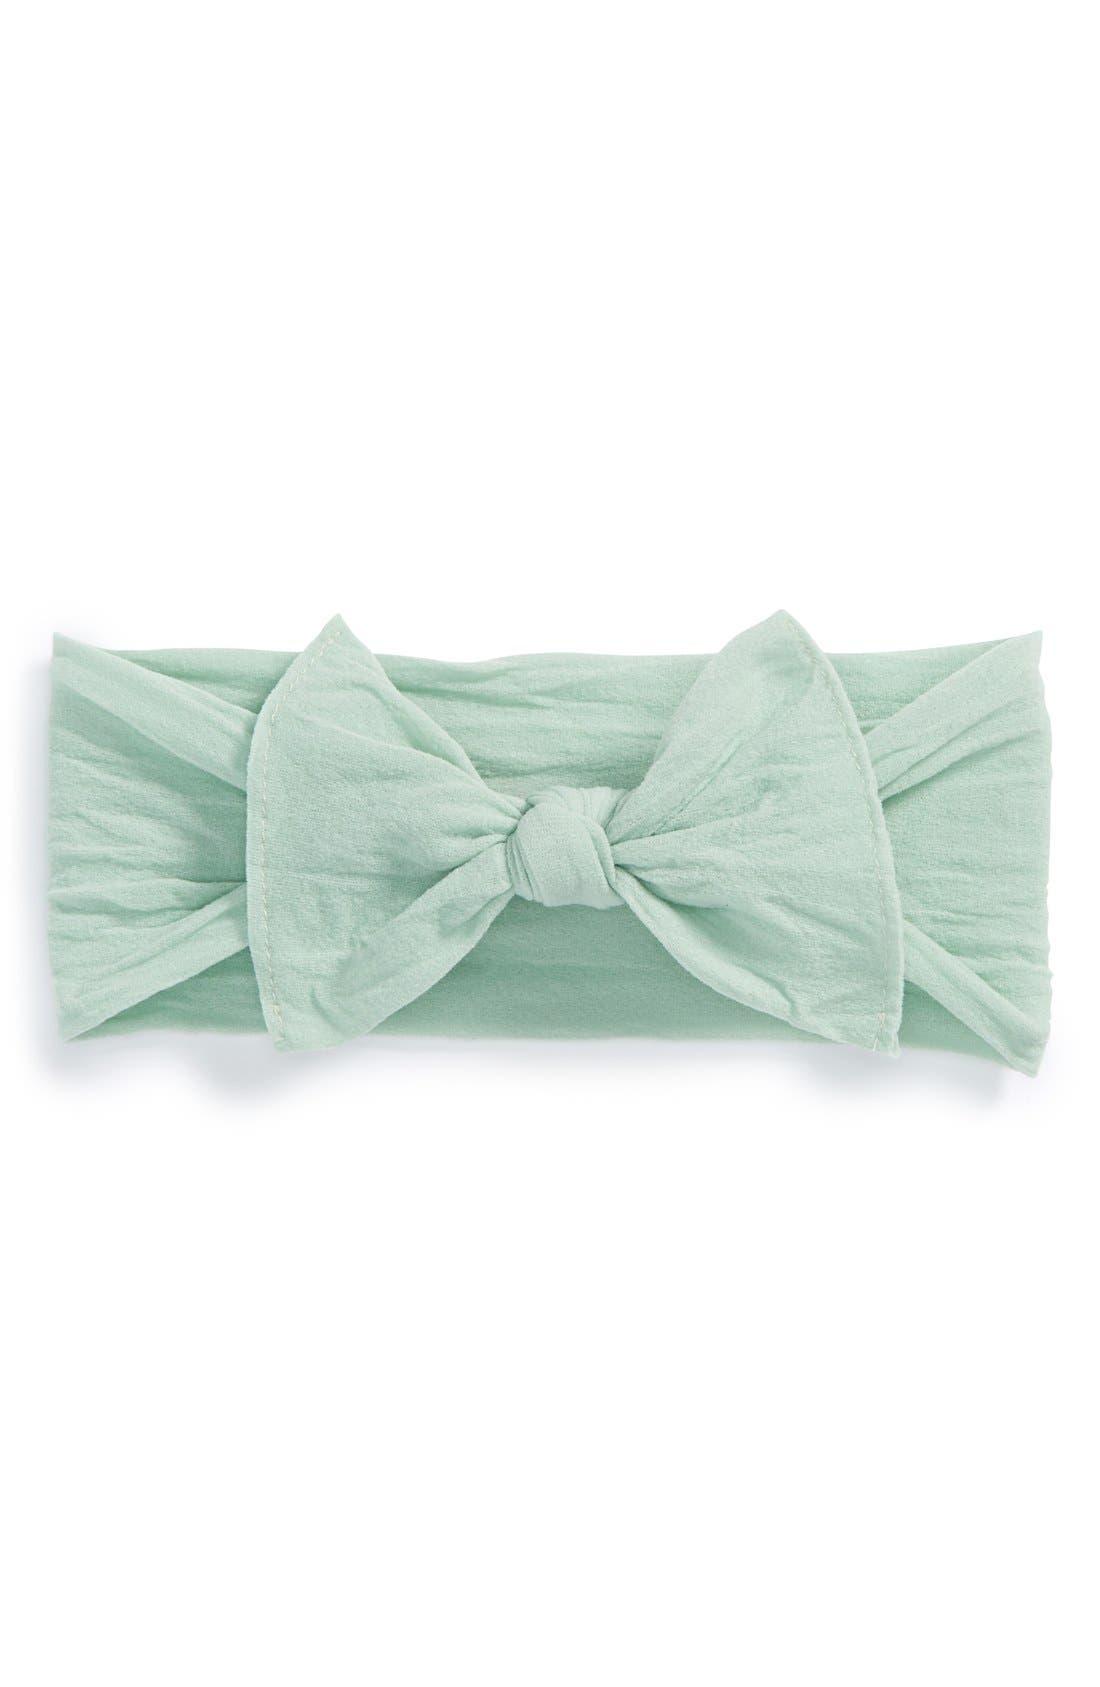 Alternate Image 1 Selected - Baby Bling Headband (Baby Girls)